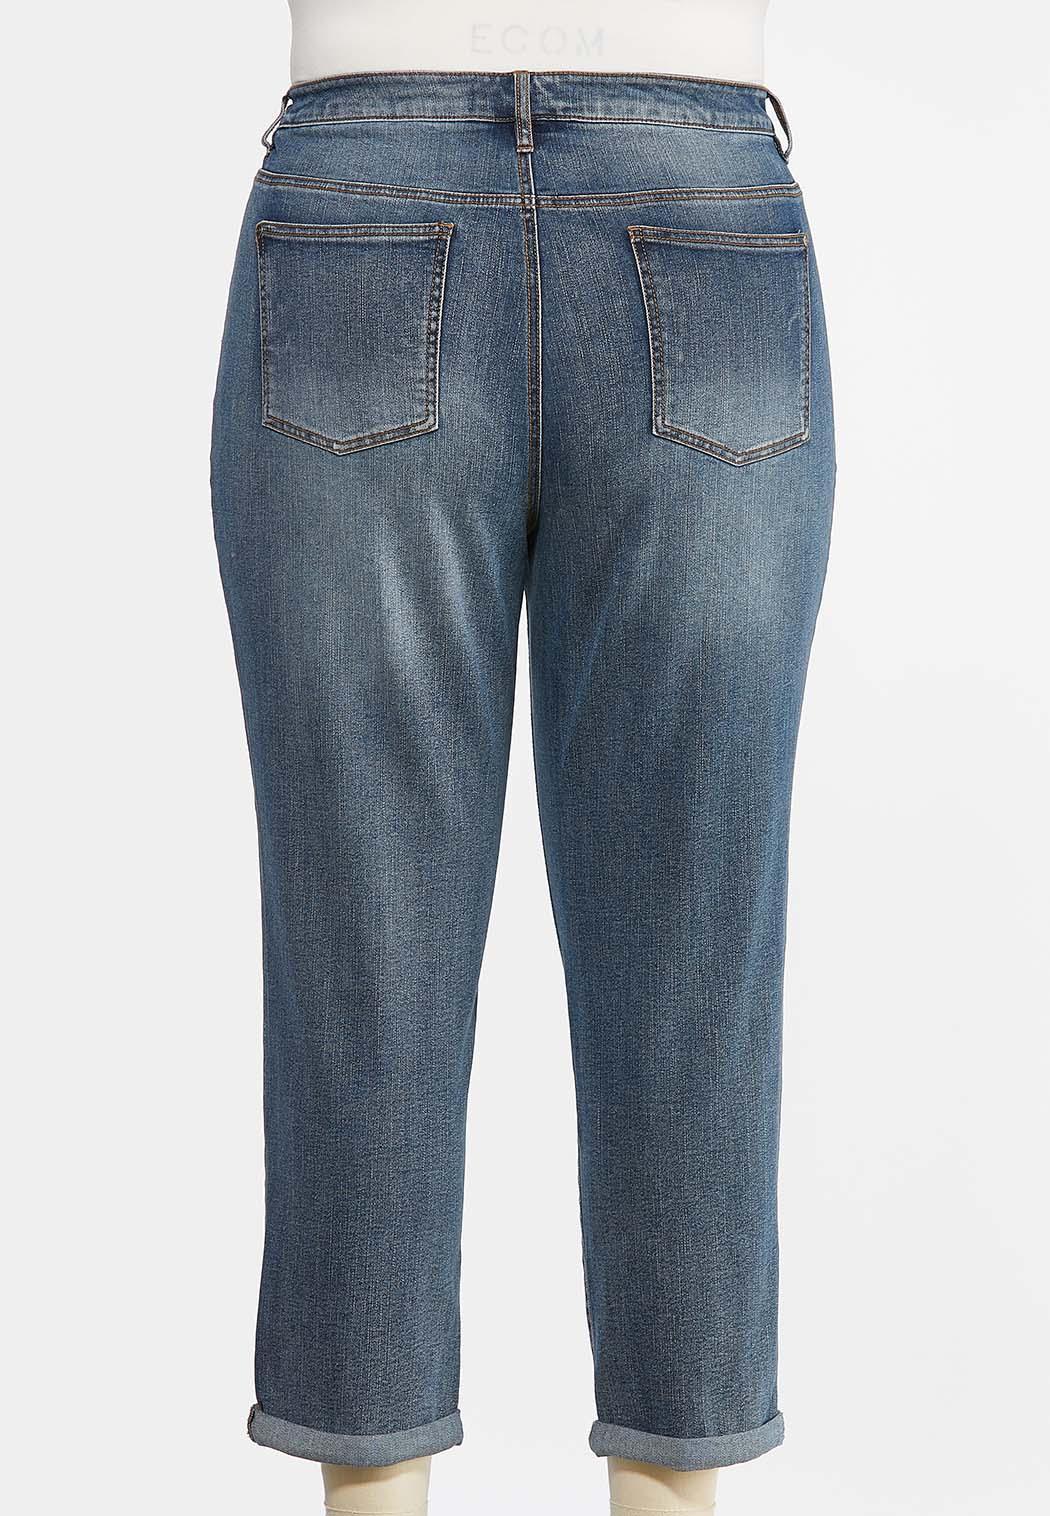 Plus Size Distressed Colored Stitch Jeans (Item #44484357)